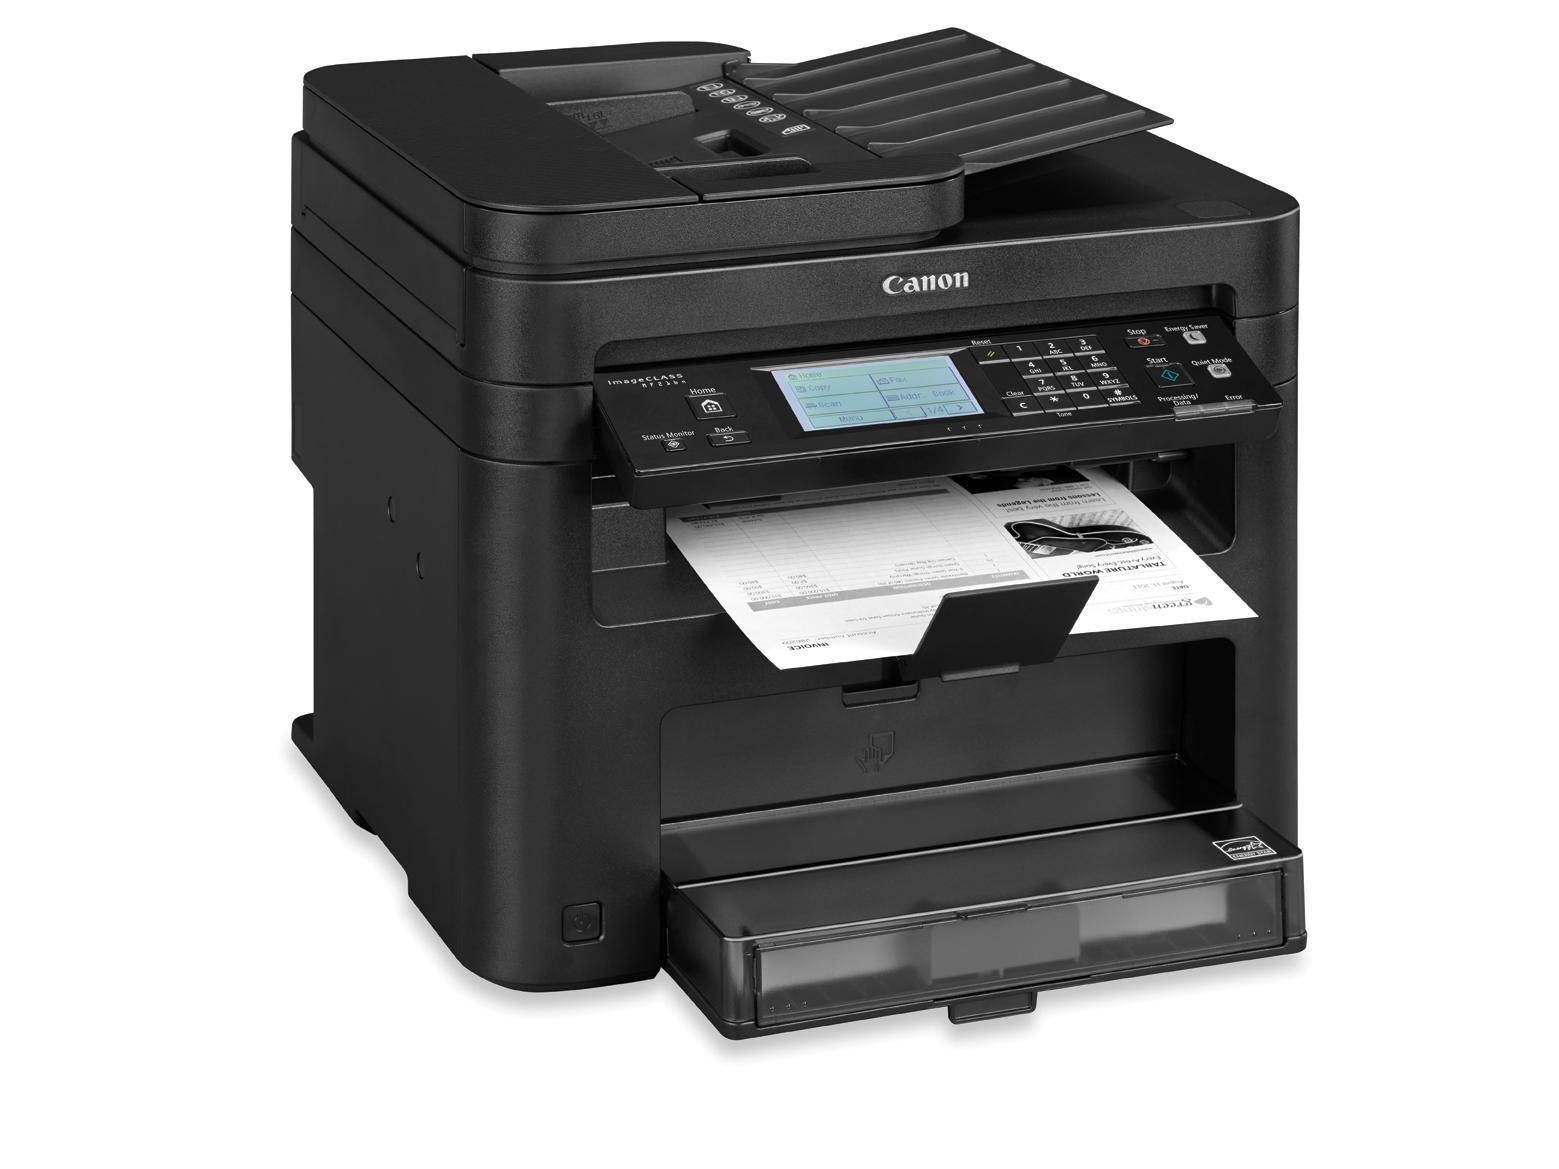 US20090086243A1 - Multi-Function Printer - Google Patents